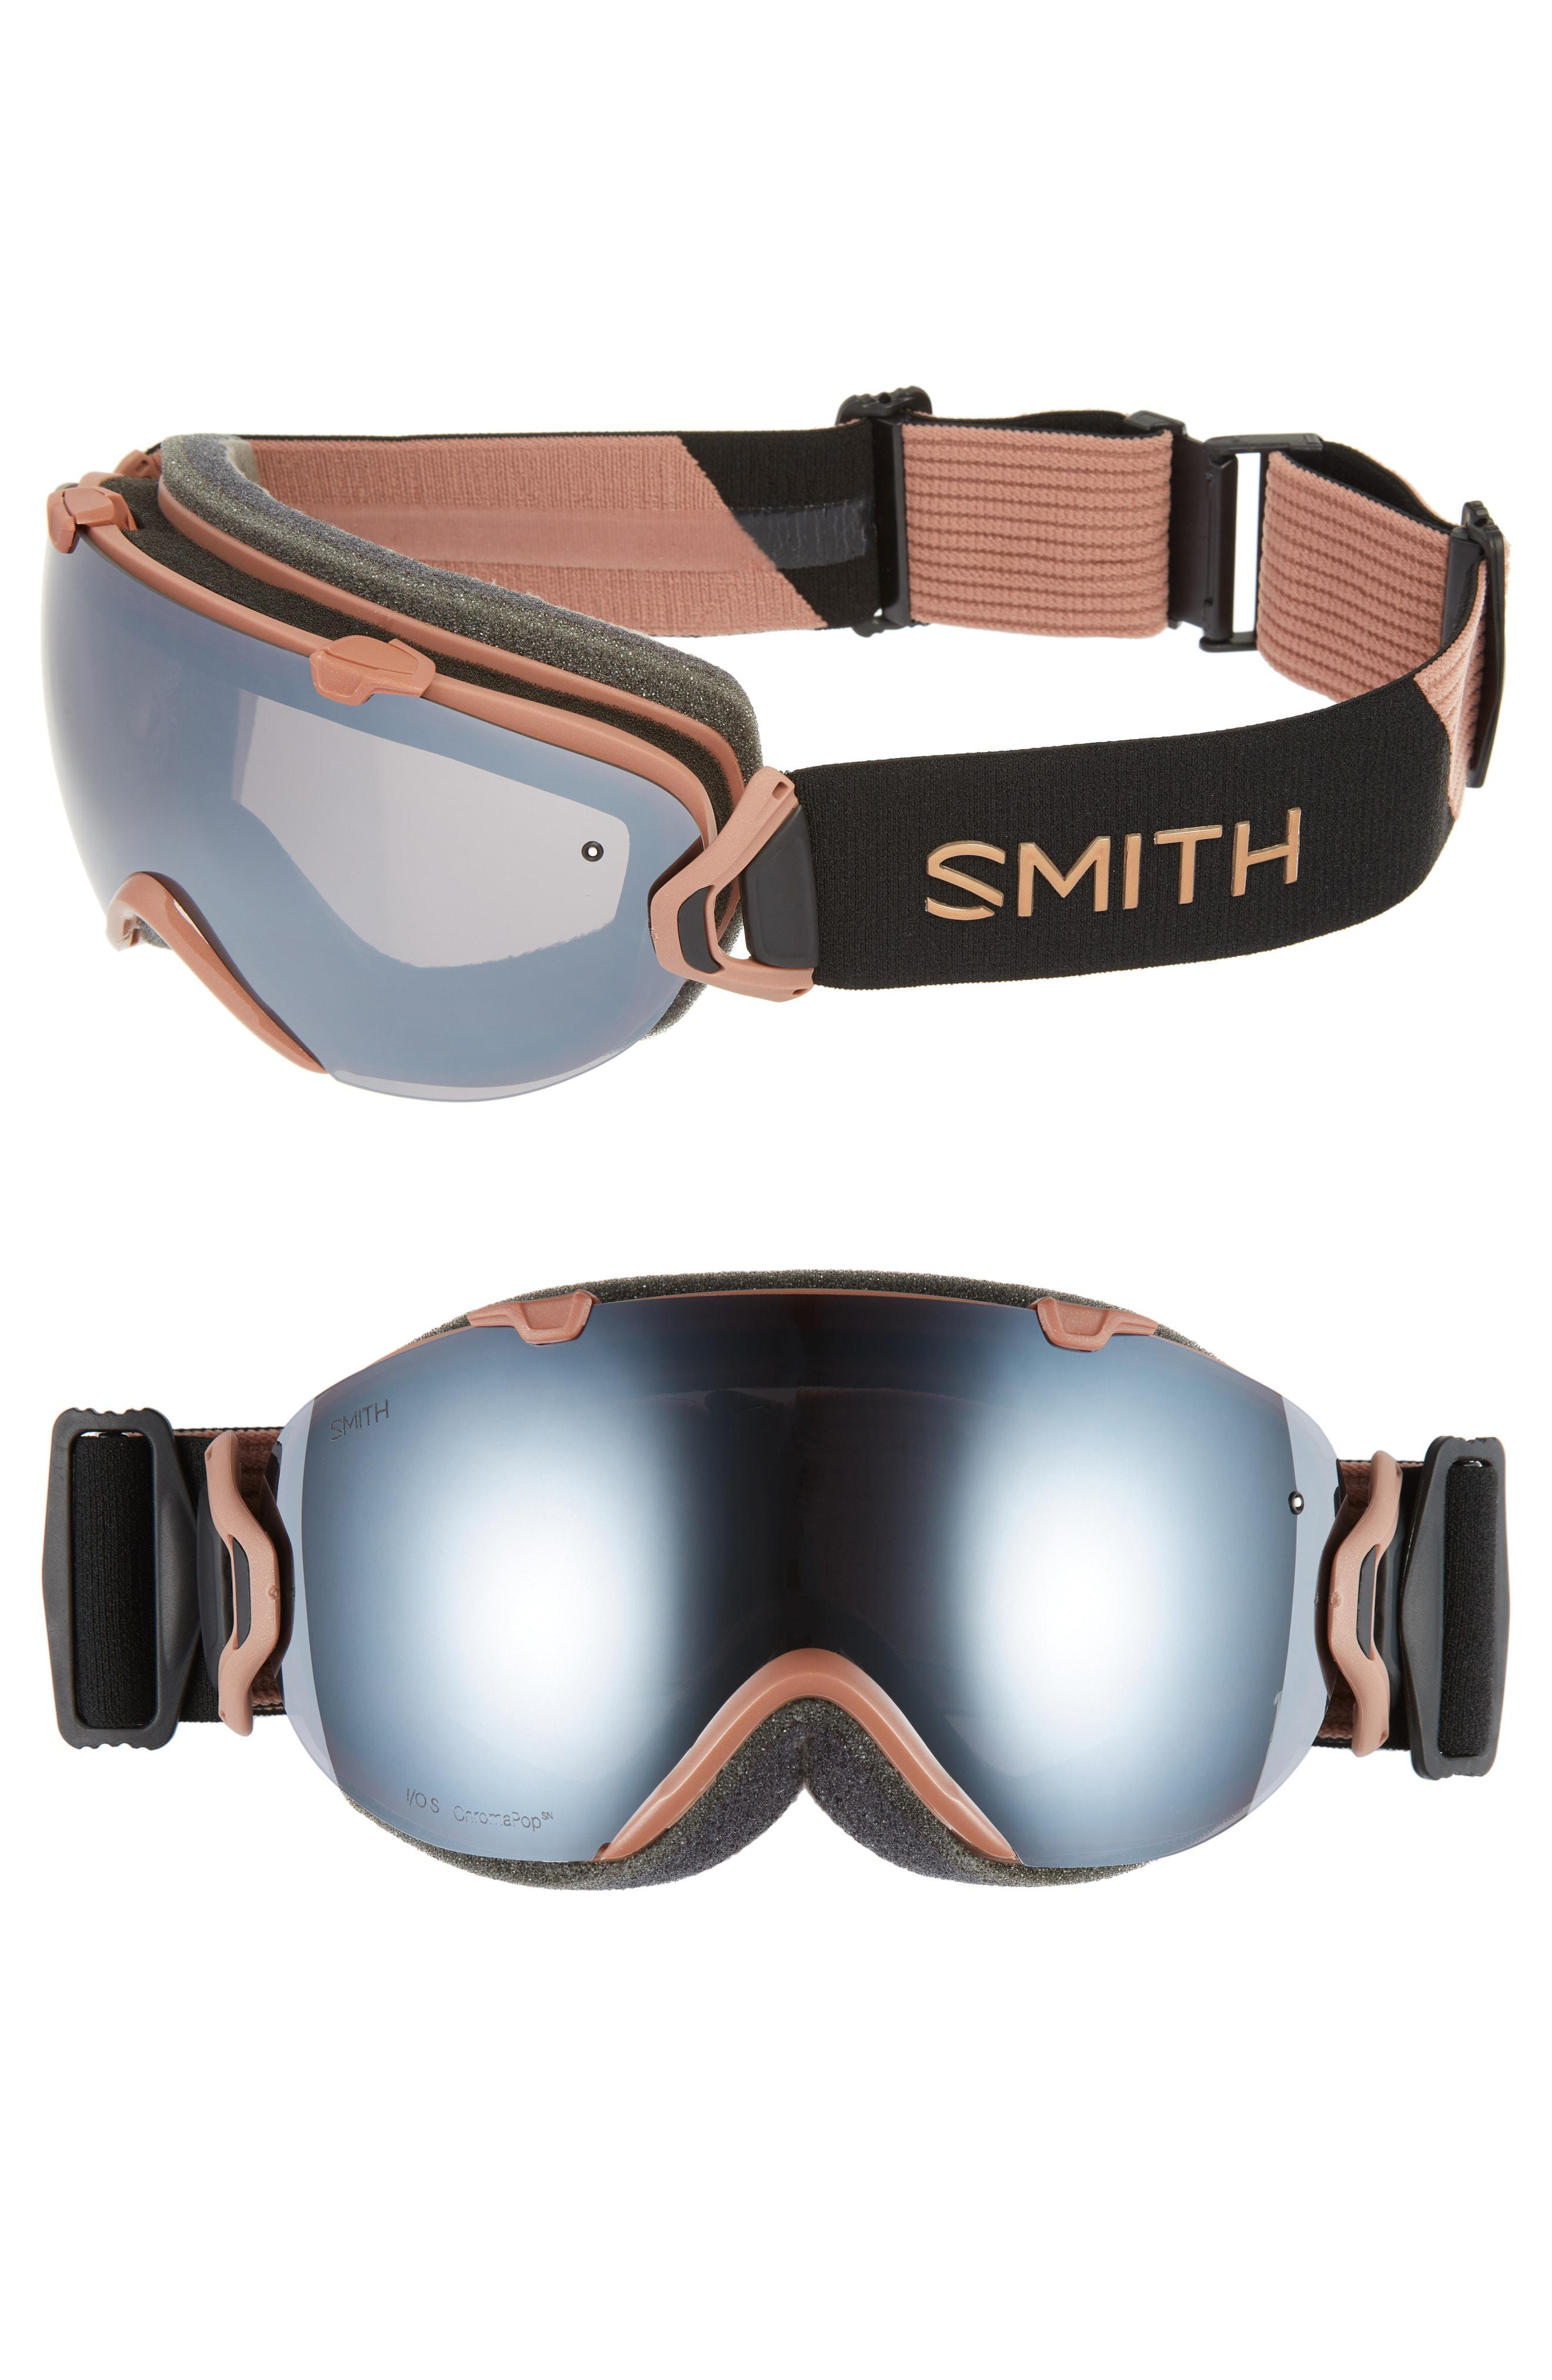 20fbbf549b Lyst - Smith I os Special Fit 190mm Chromapop Snow Goggles